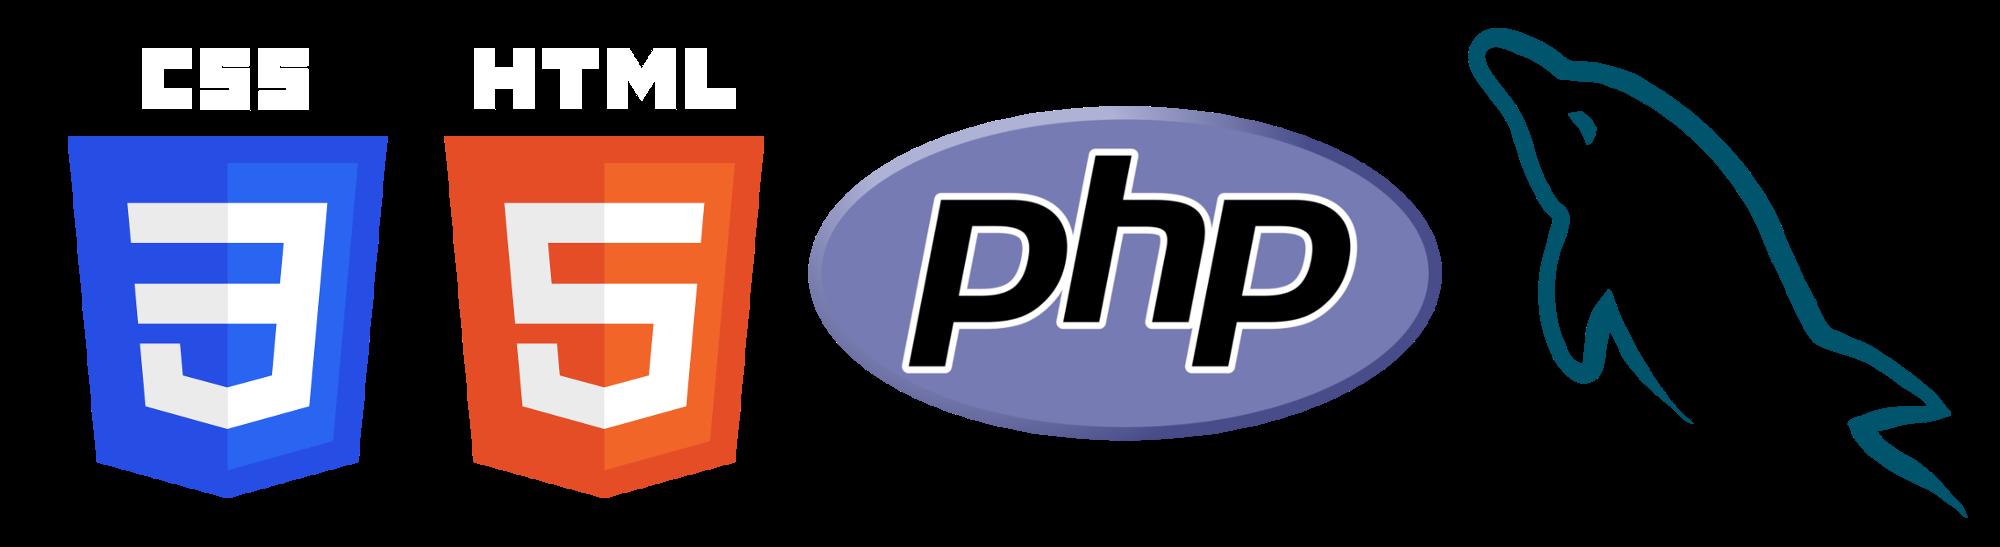 Logo css clipart jpg library stock Html Css Php Mysql Logo Png Transparent jpg library stock